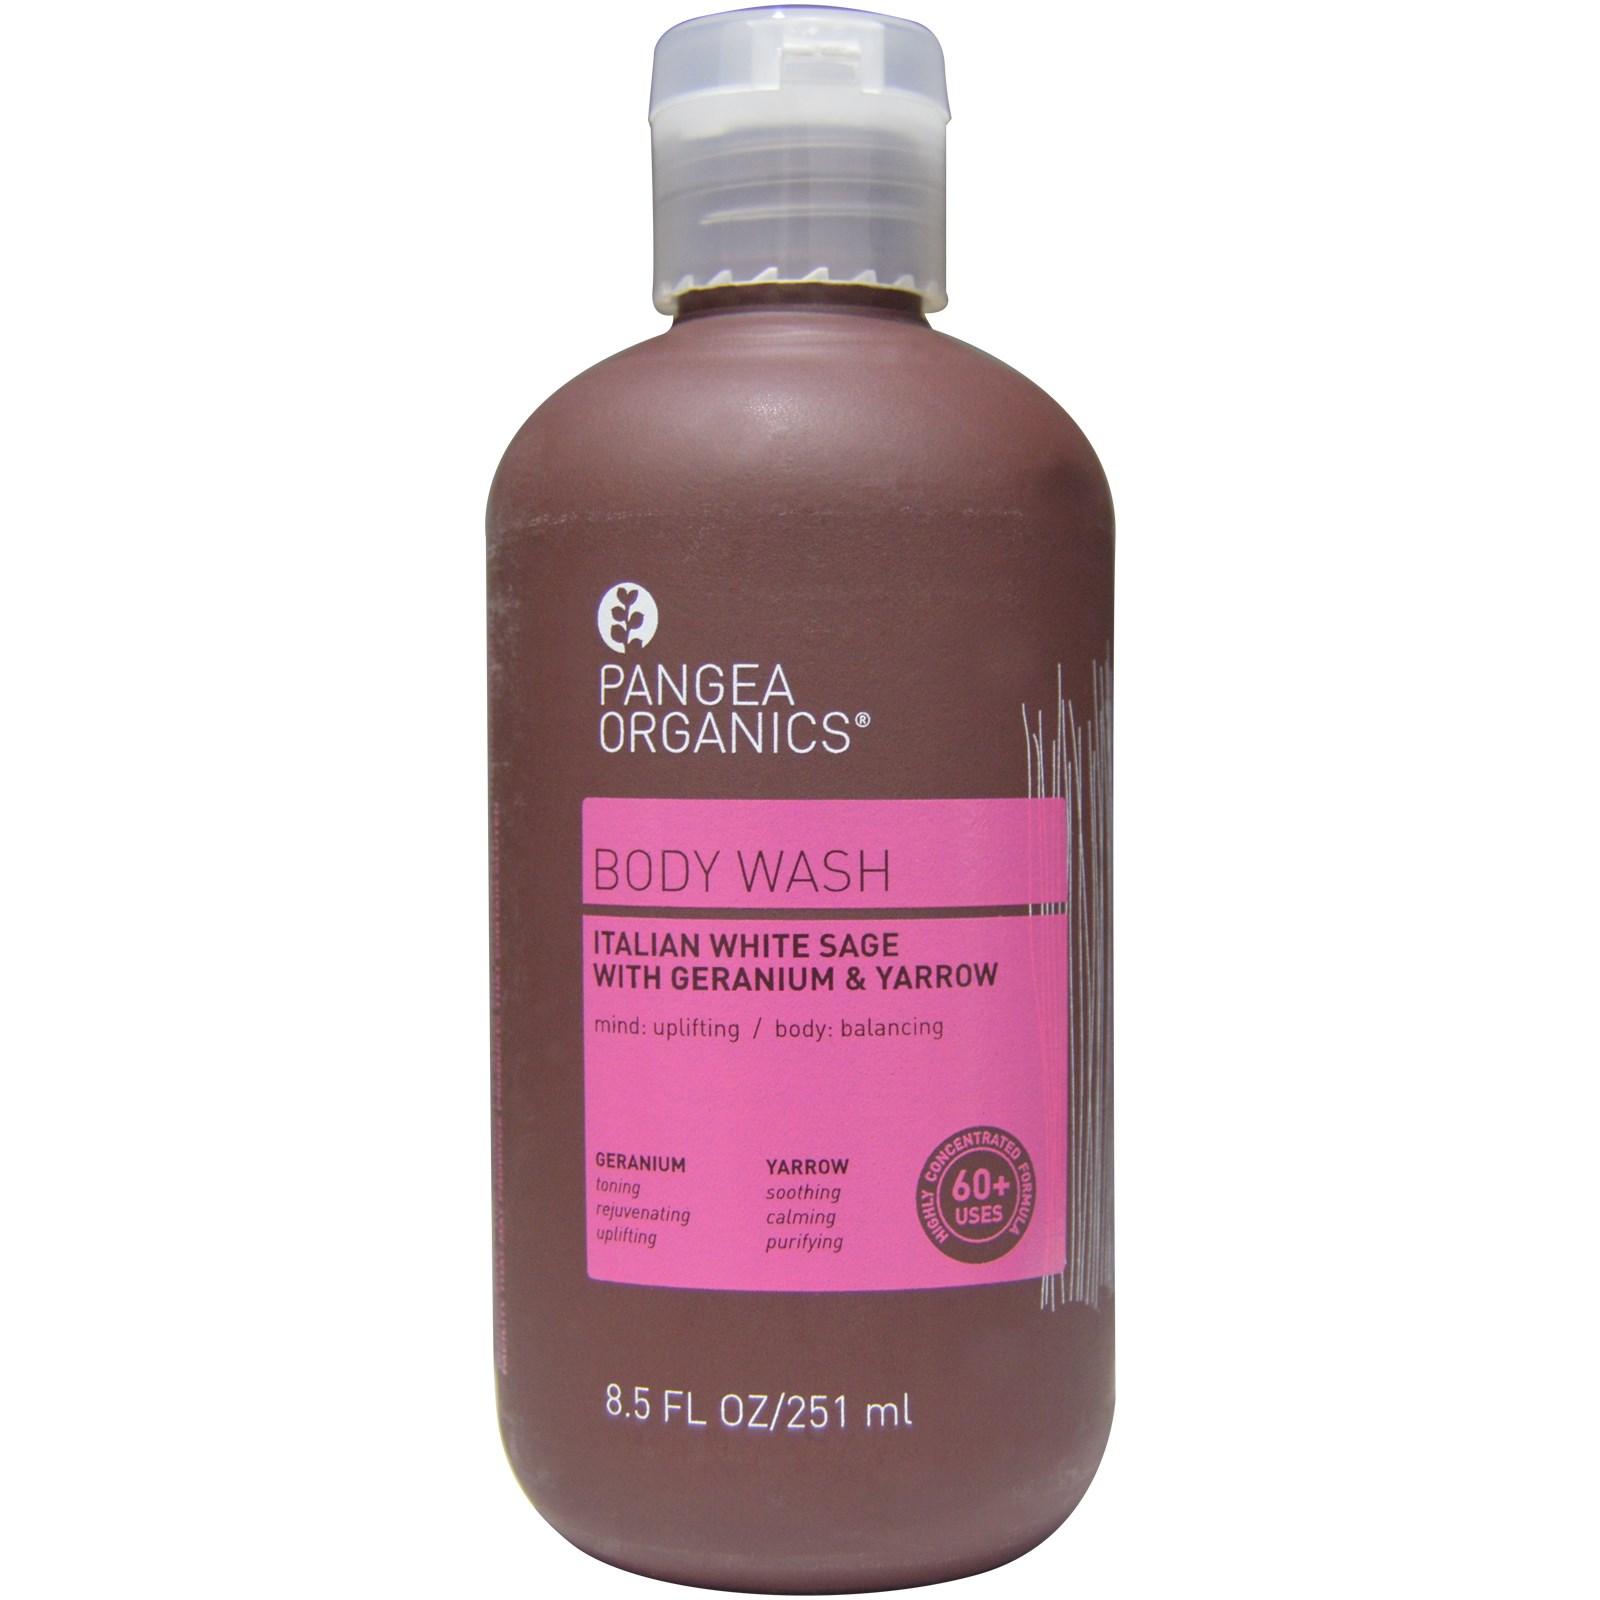 Pangea Organics, Shower Gel, Italian White Sage with Geranium & Yarrow, 8.5 fl oz (250 ml)